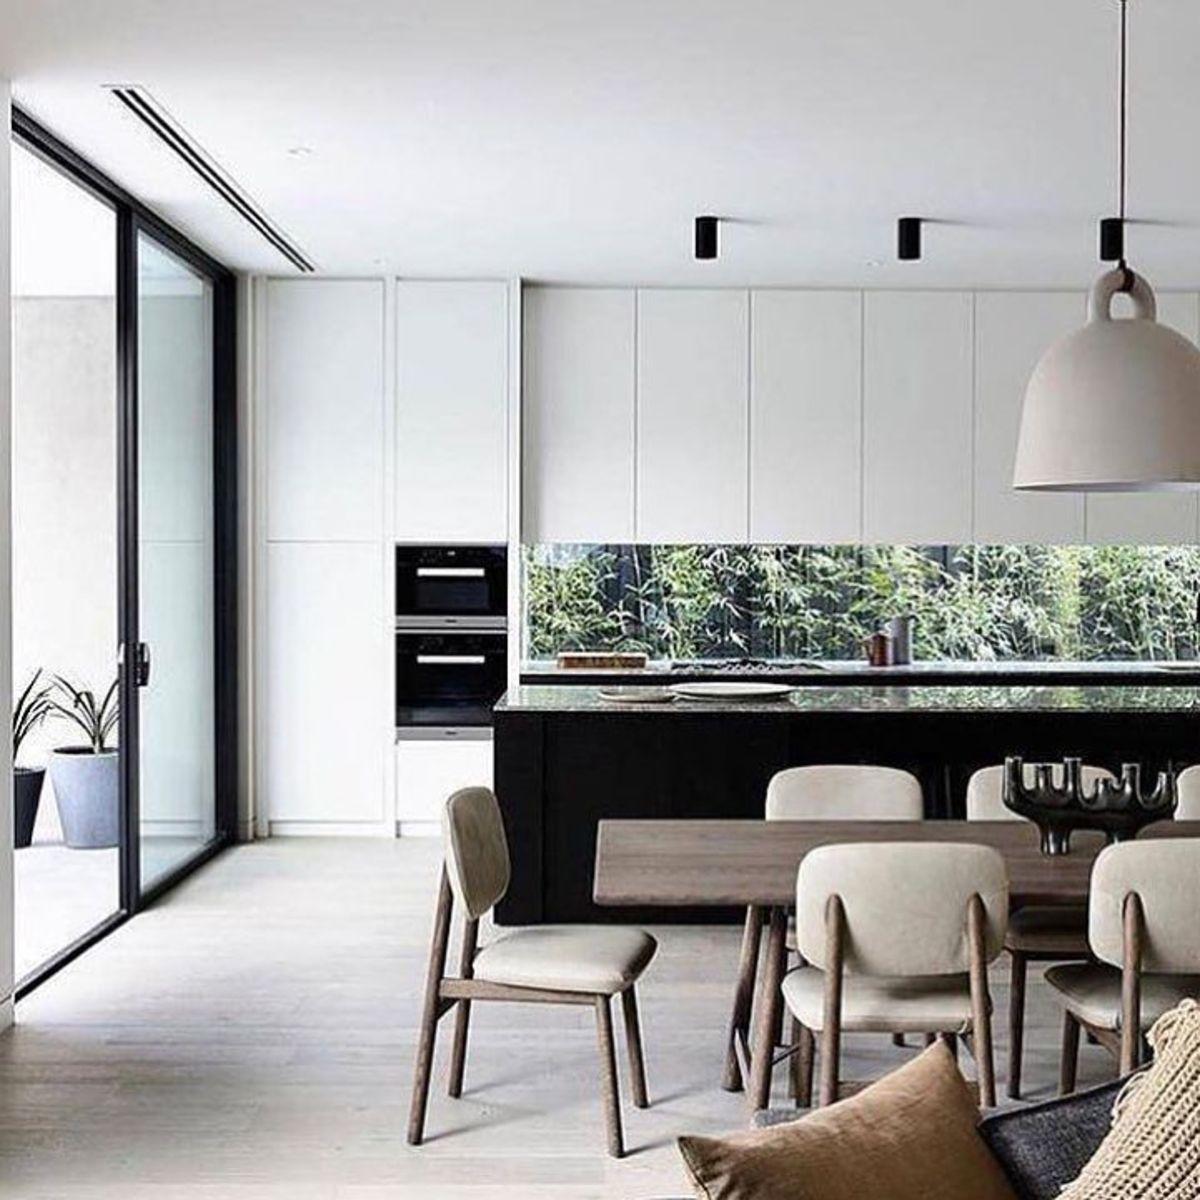 13 Dining Room And Kitchen Design Minimalist: Minimal Interior Design Inspiration